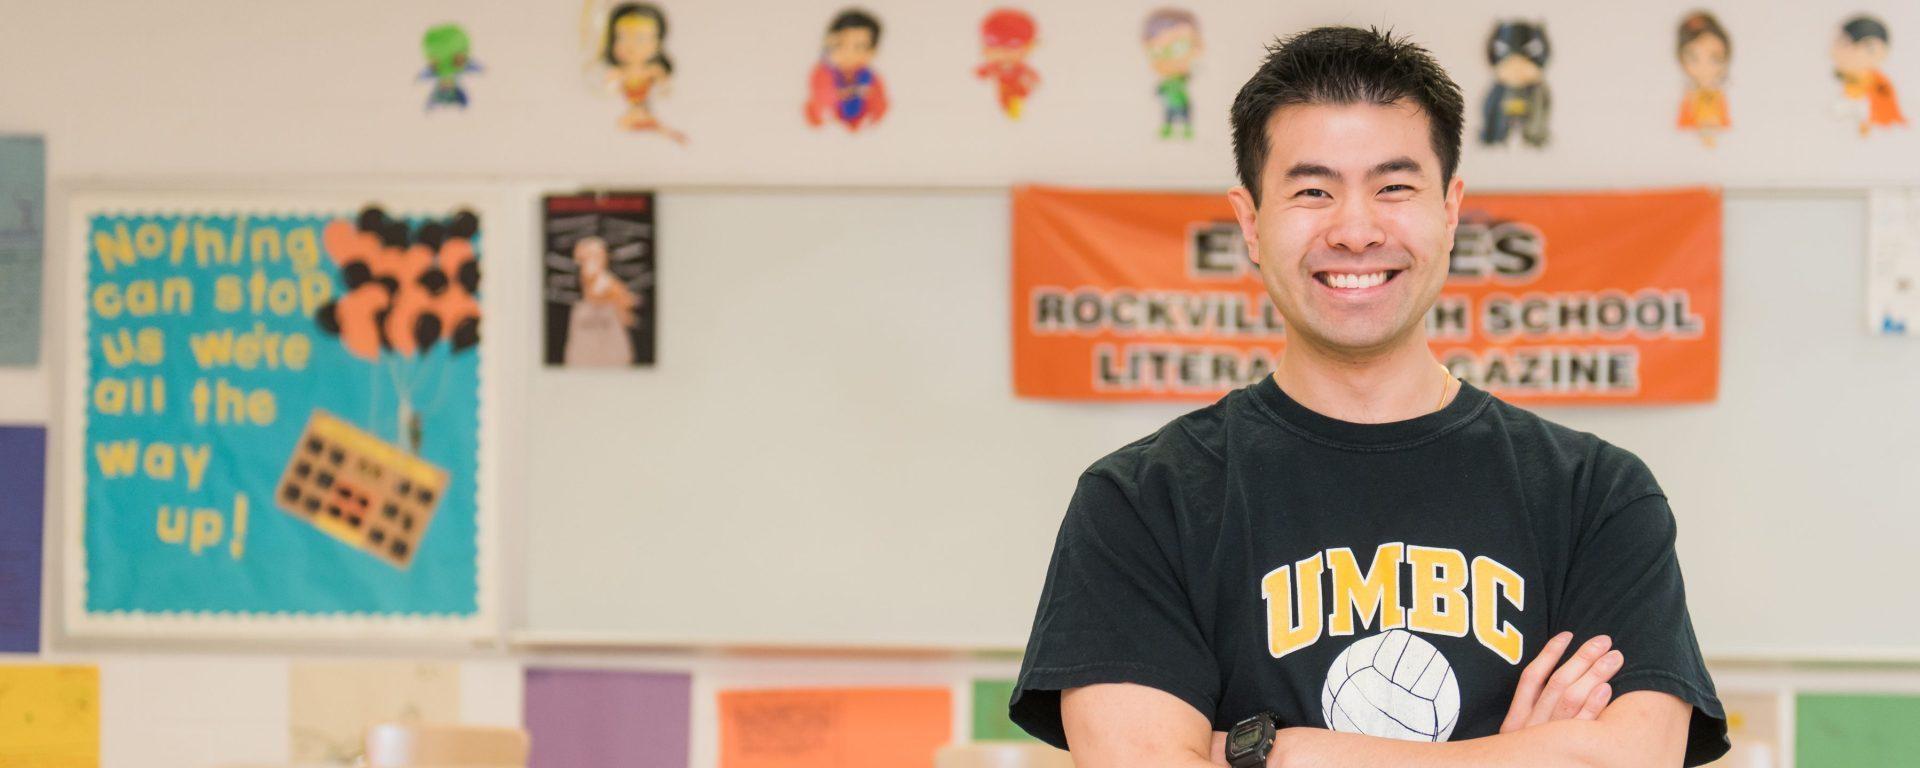 UMBC alumnus Sean Pang in his classroom